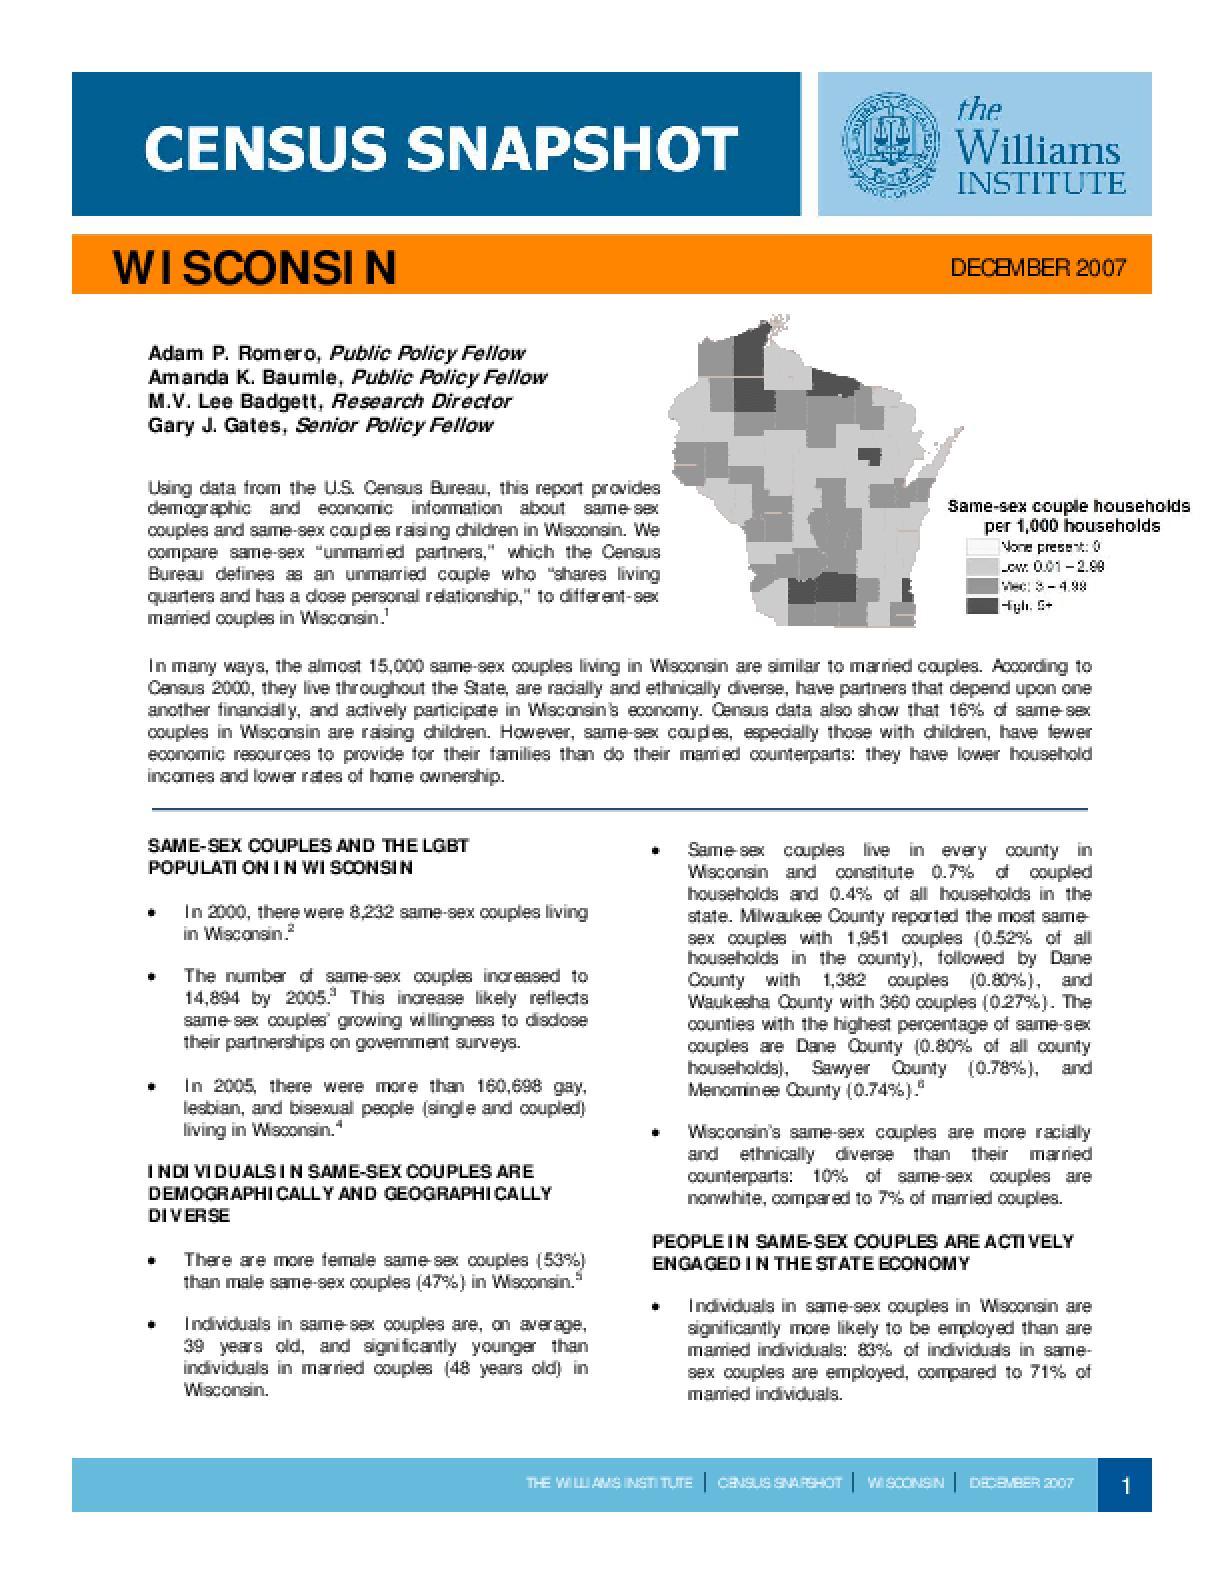 Census Snapshot: Wisconsin